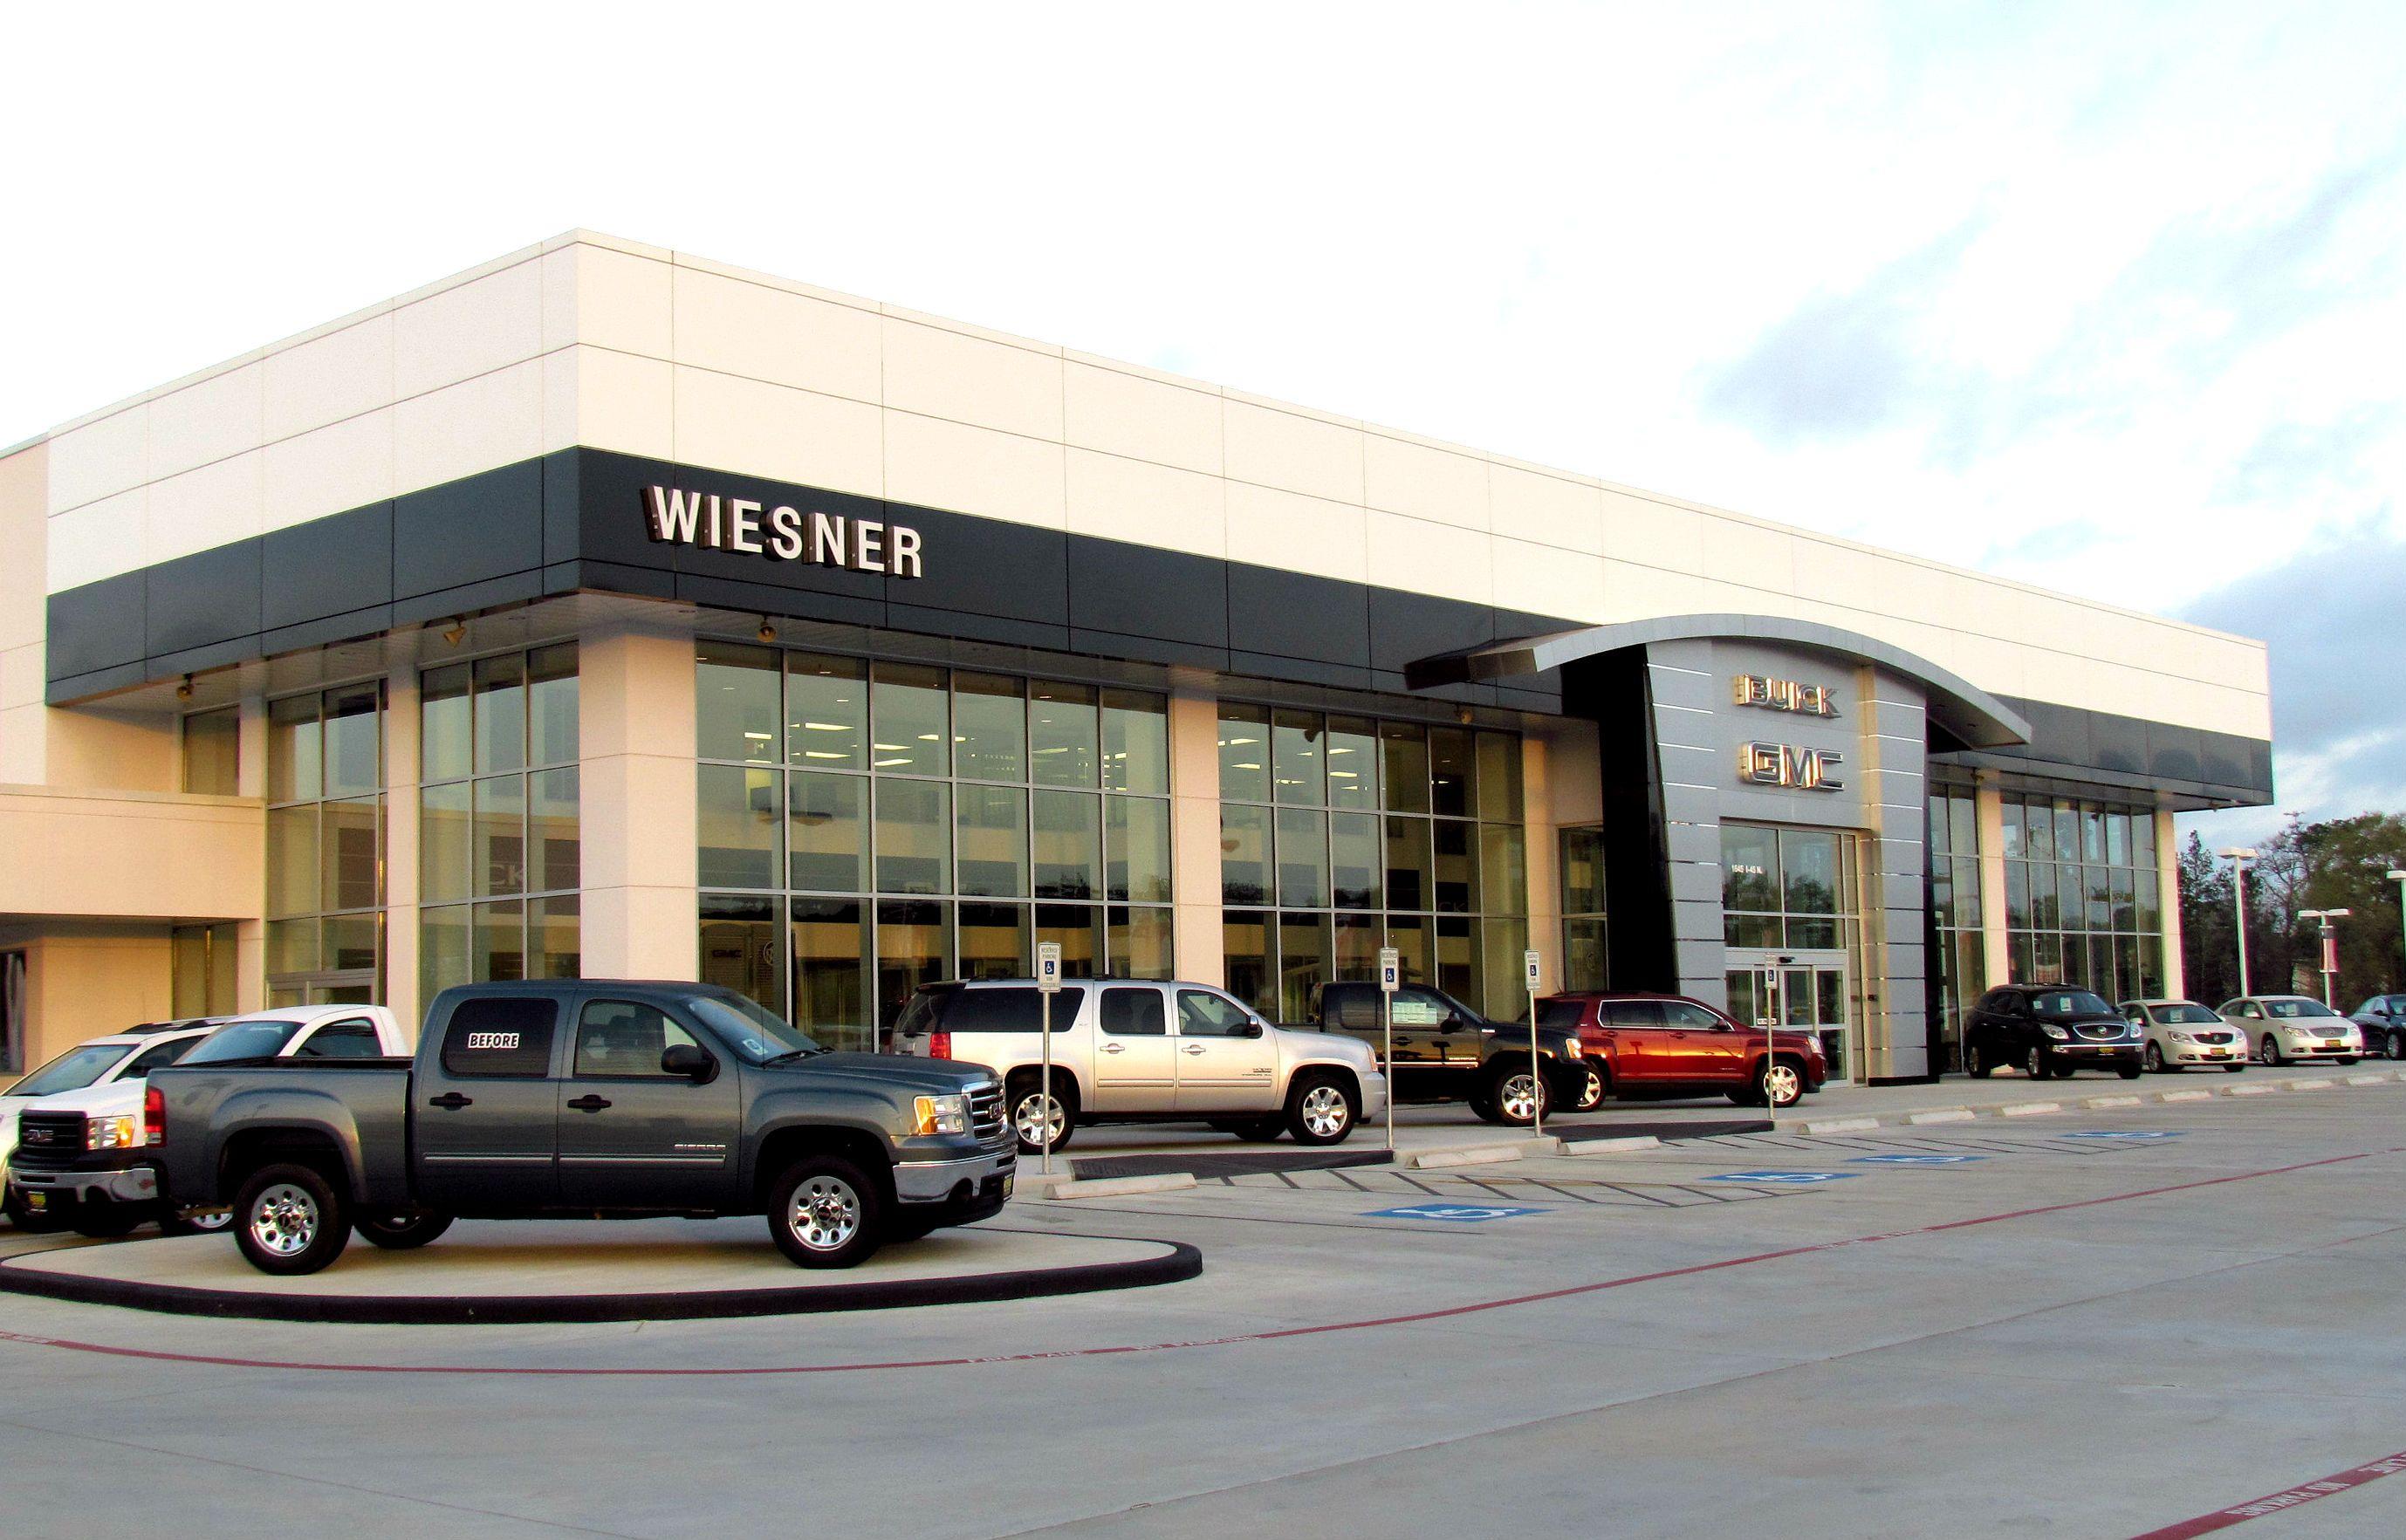 WIESNER BUICKGMC CONROE TX NEW FACILITY Buick gmc, Car